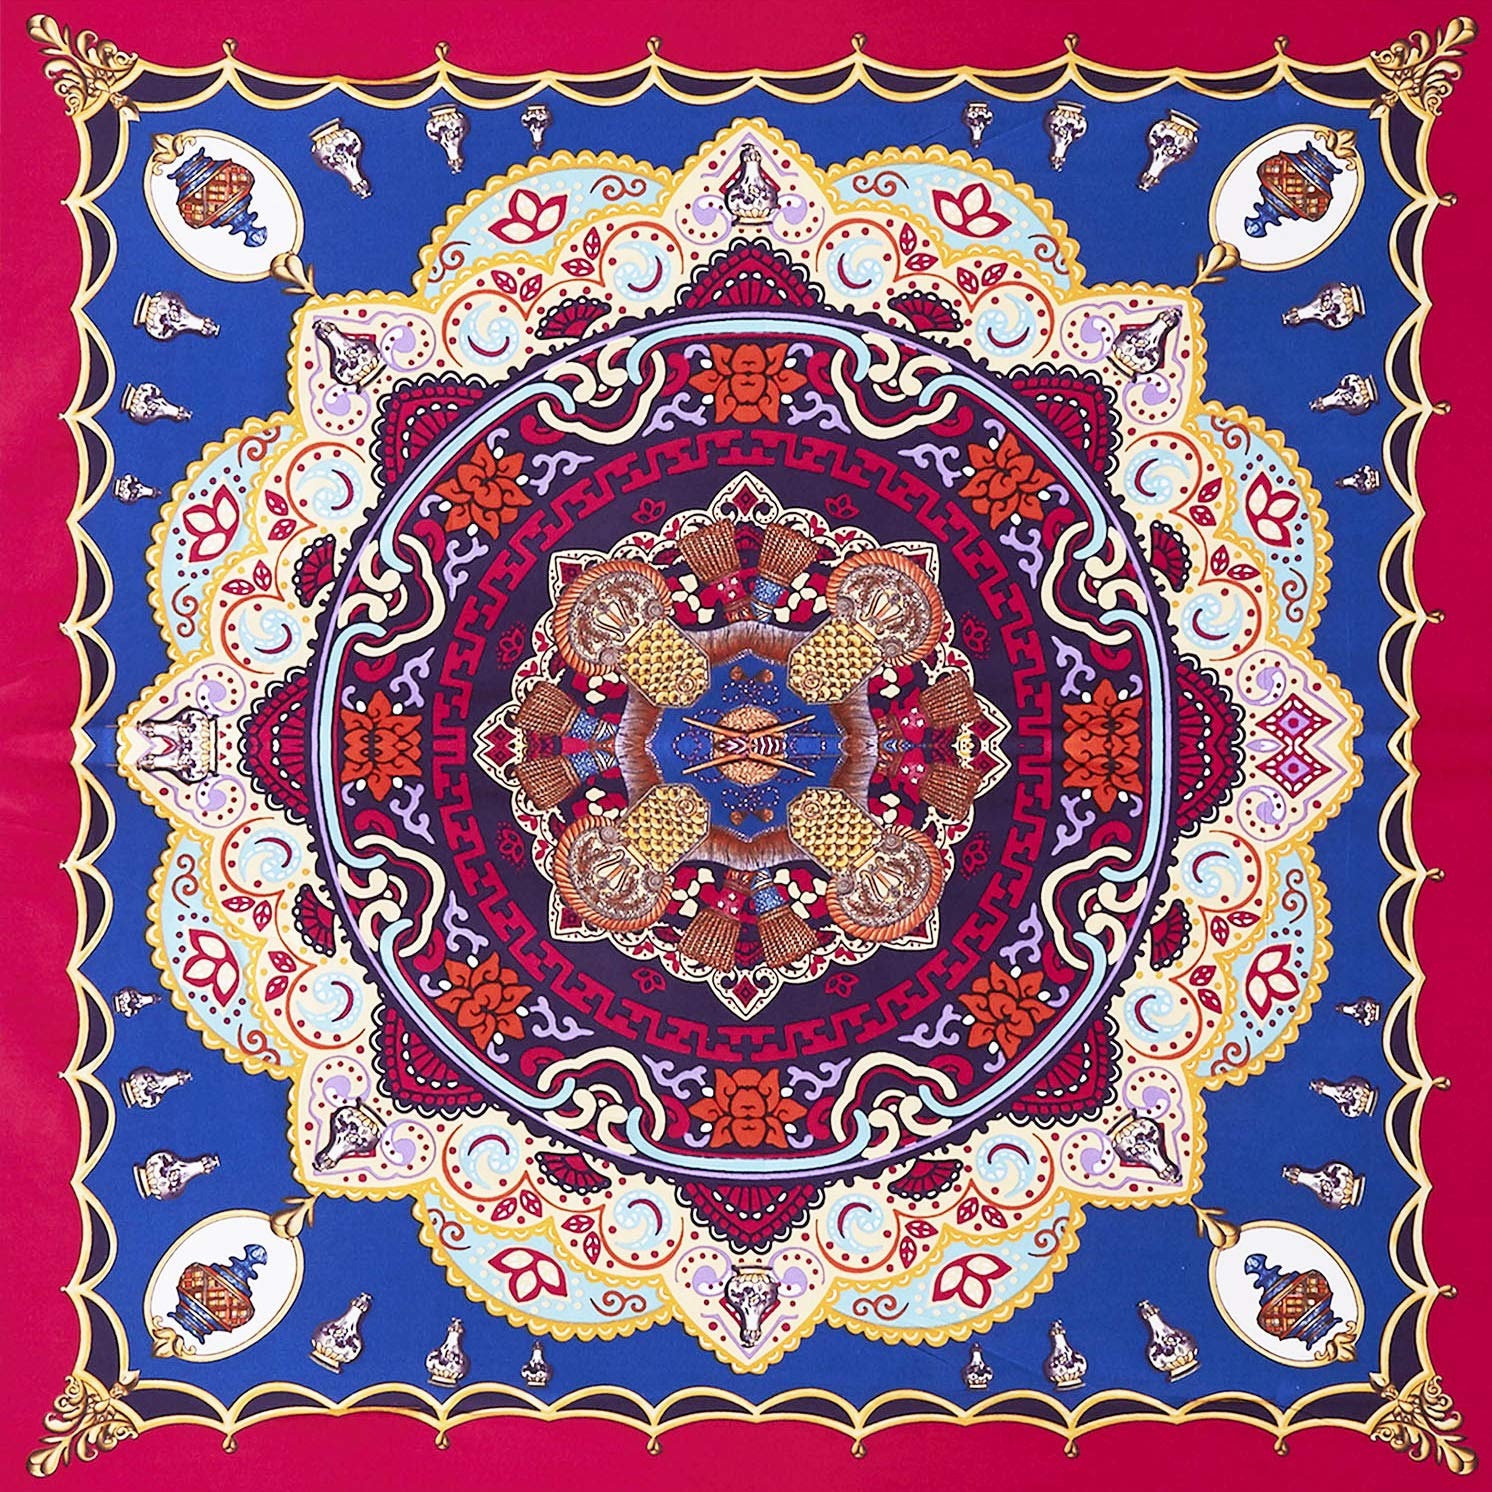 Wake In Cloud - Mandala Comforter Set, Orange Bohemian Boho Chic Medallion Pattern Printed, Soft Microfiber Bedding (3pcs, King Size) by Wake In Cloud (Image #2)